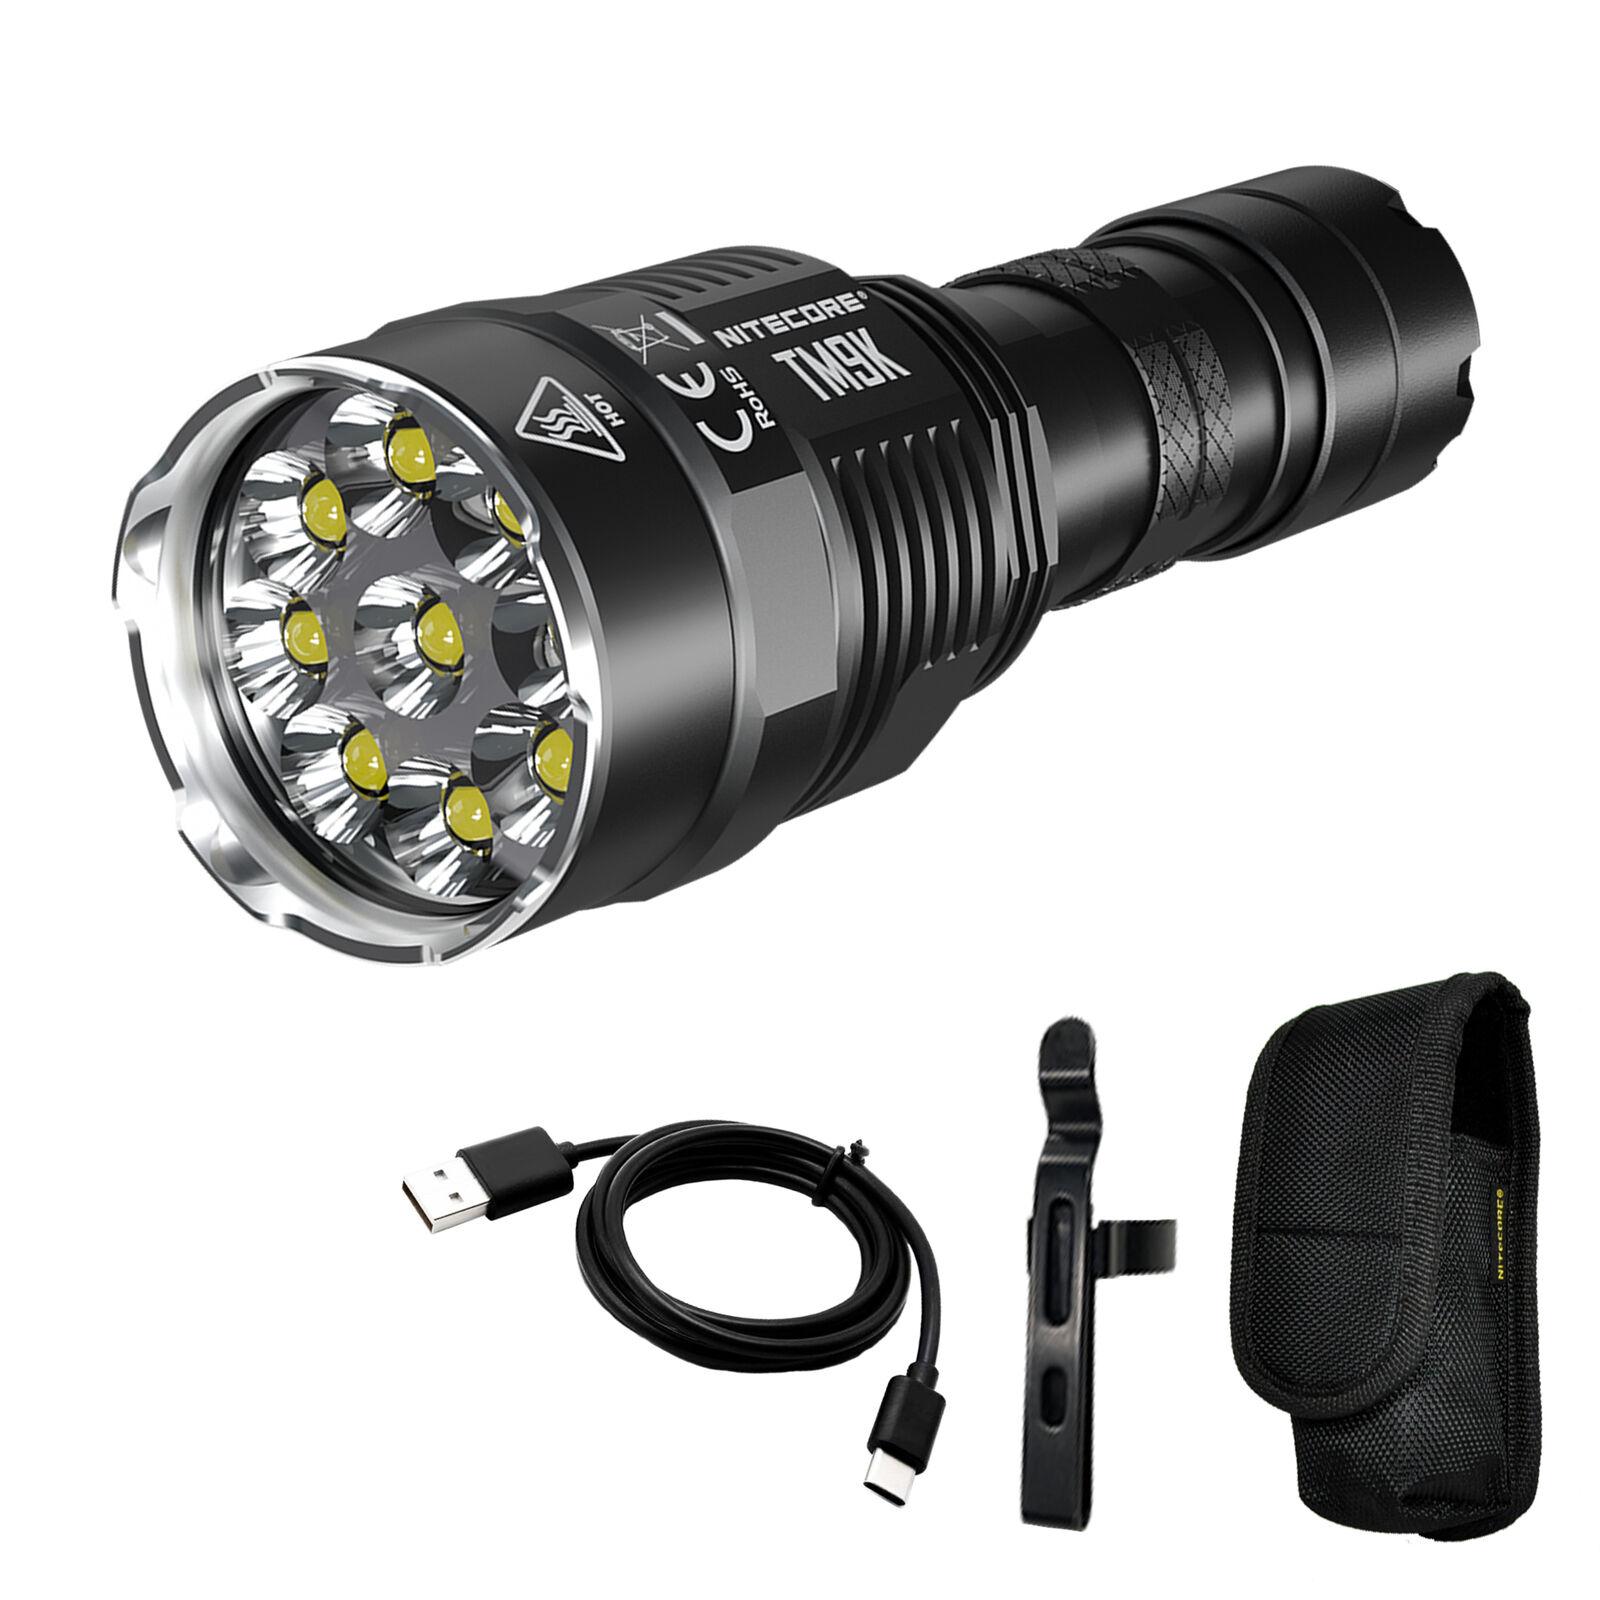 NITECORE TM9K 9500 Lumen USB-C QC Rechargeable Flashlight